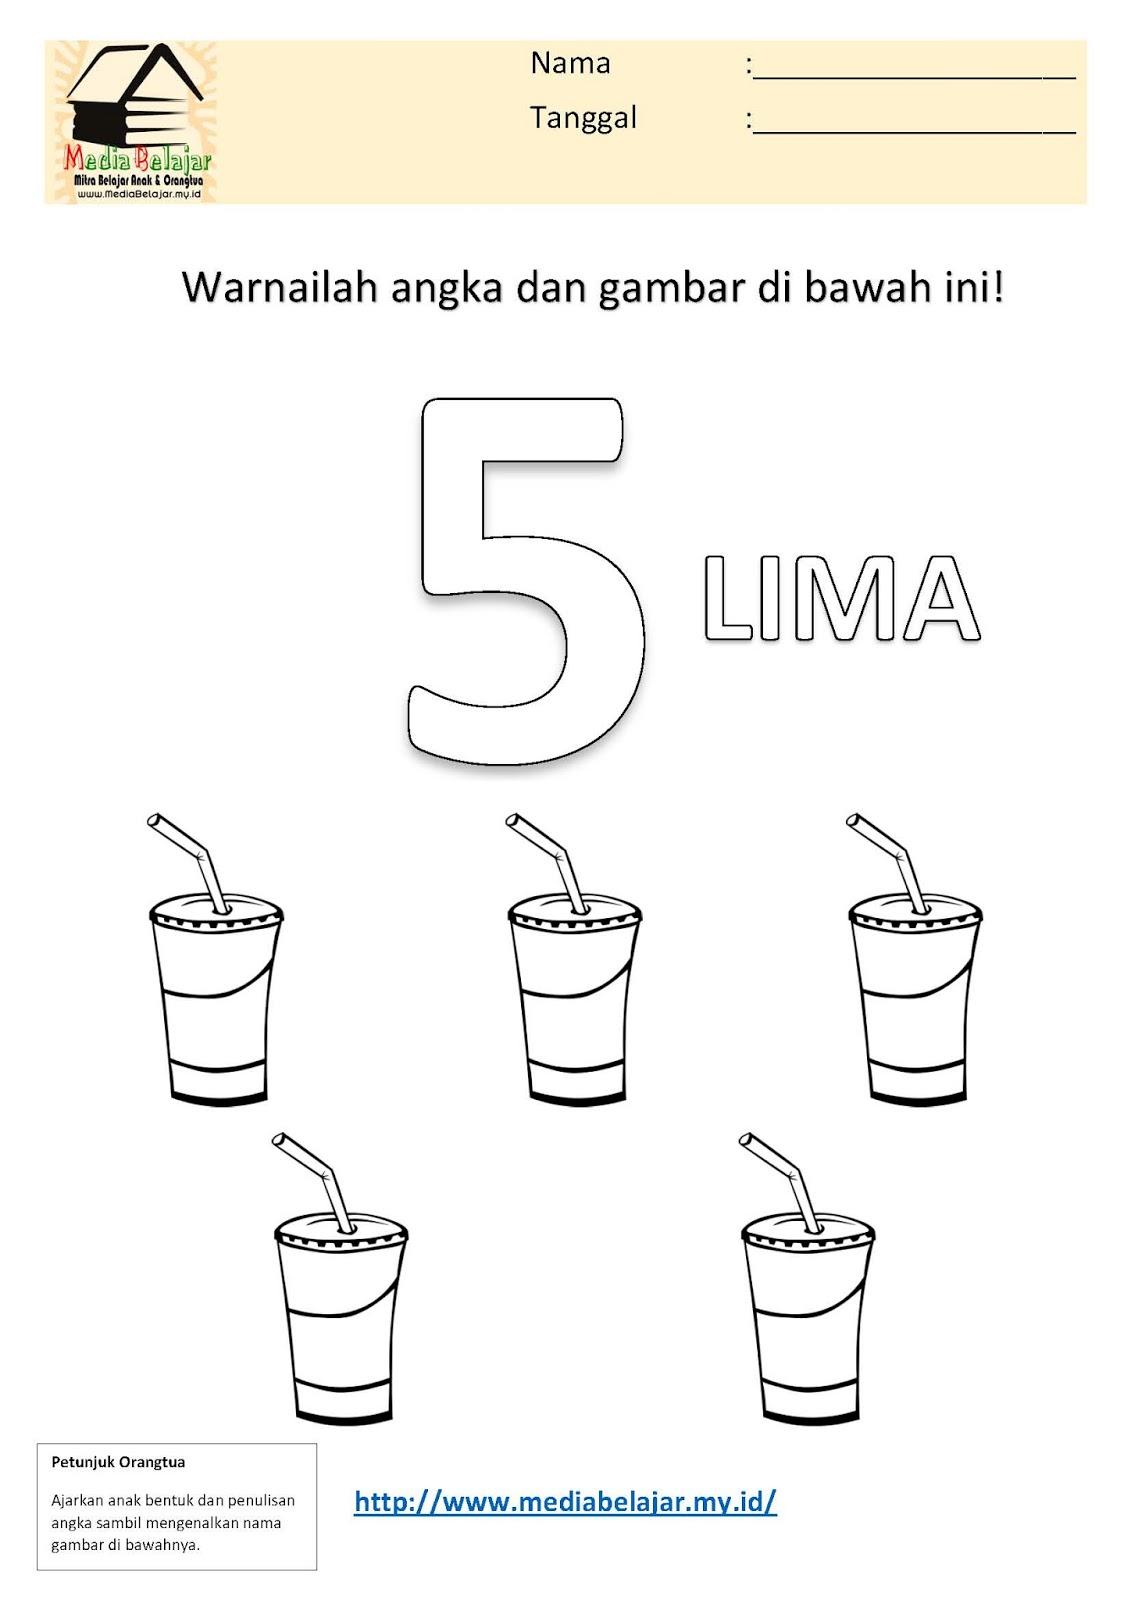 Mewarnai Angka 5 Lima Dan Mewarnai Gambar Minuman